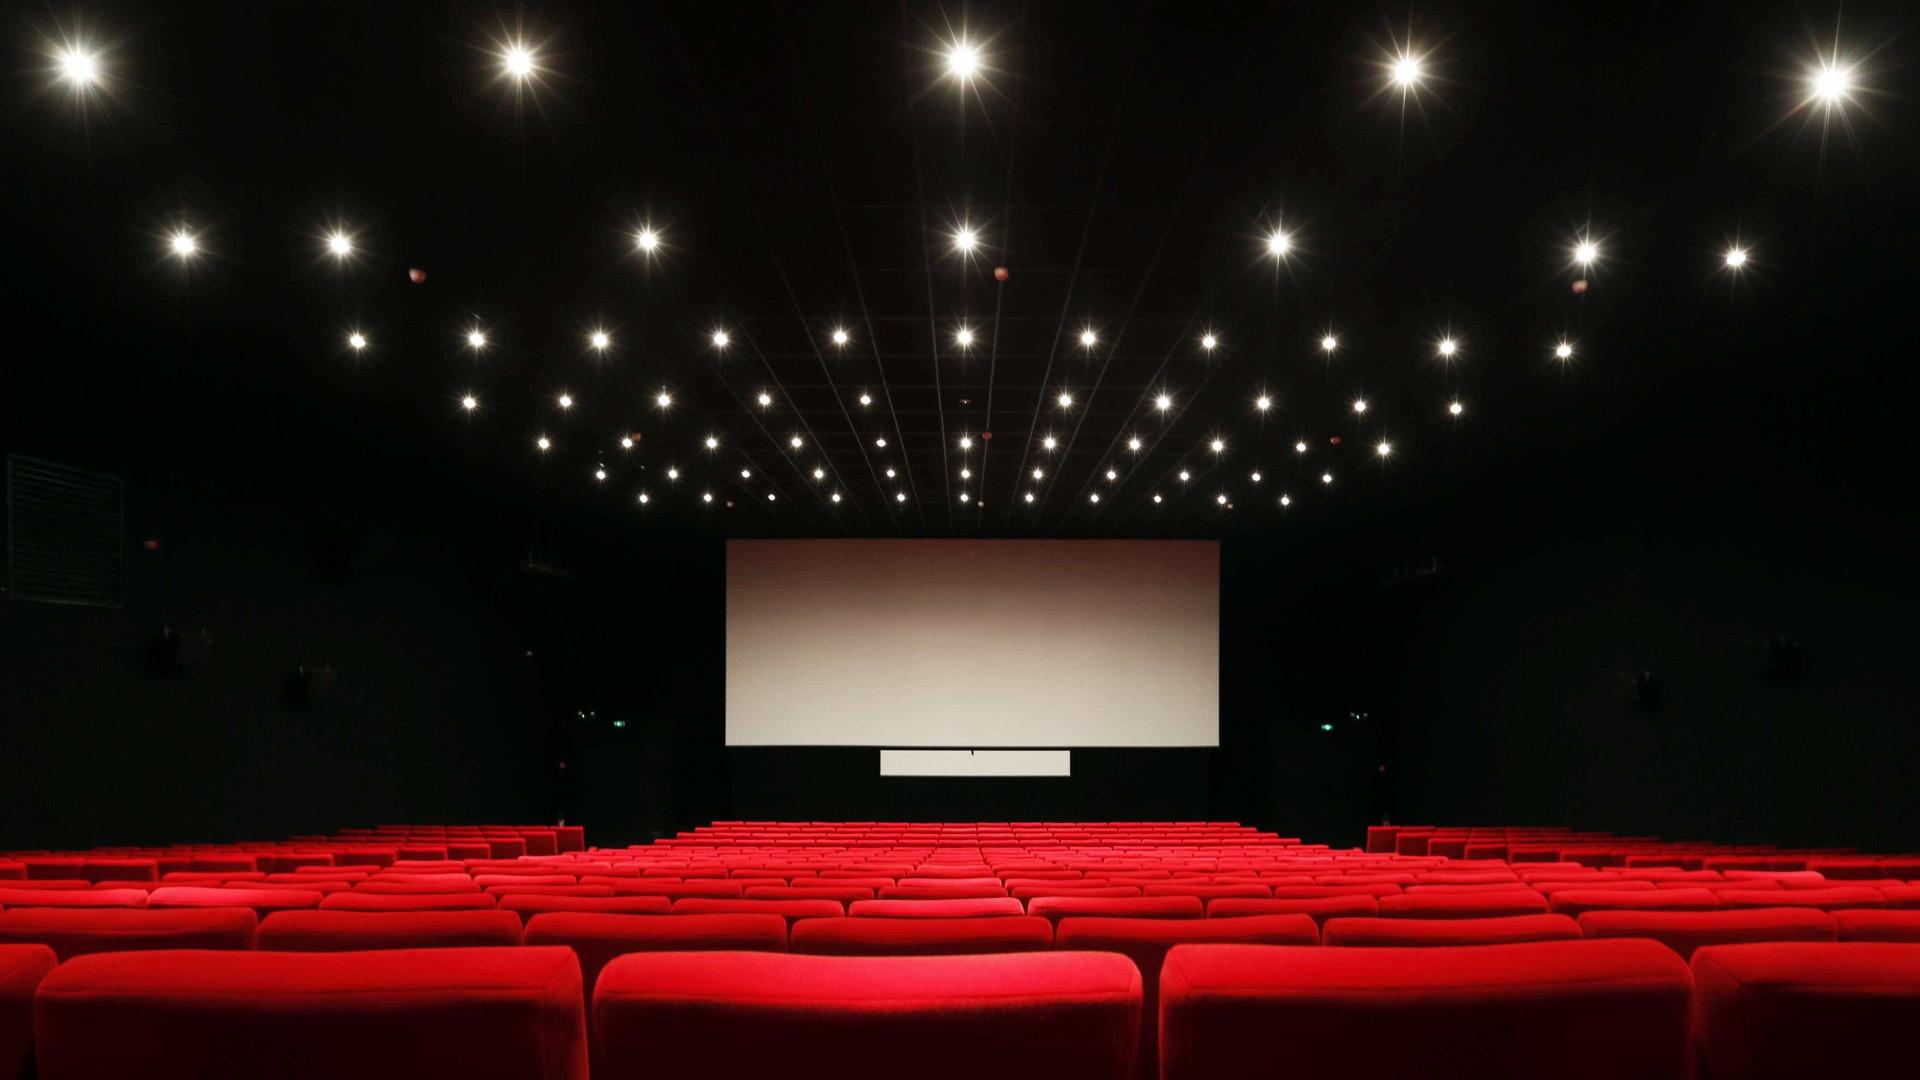 Filmes de Gabriel Abrantes e Bruszewska vencedores do Córtex 2018